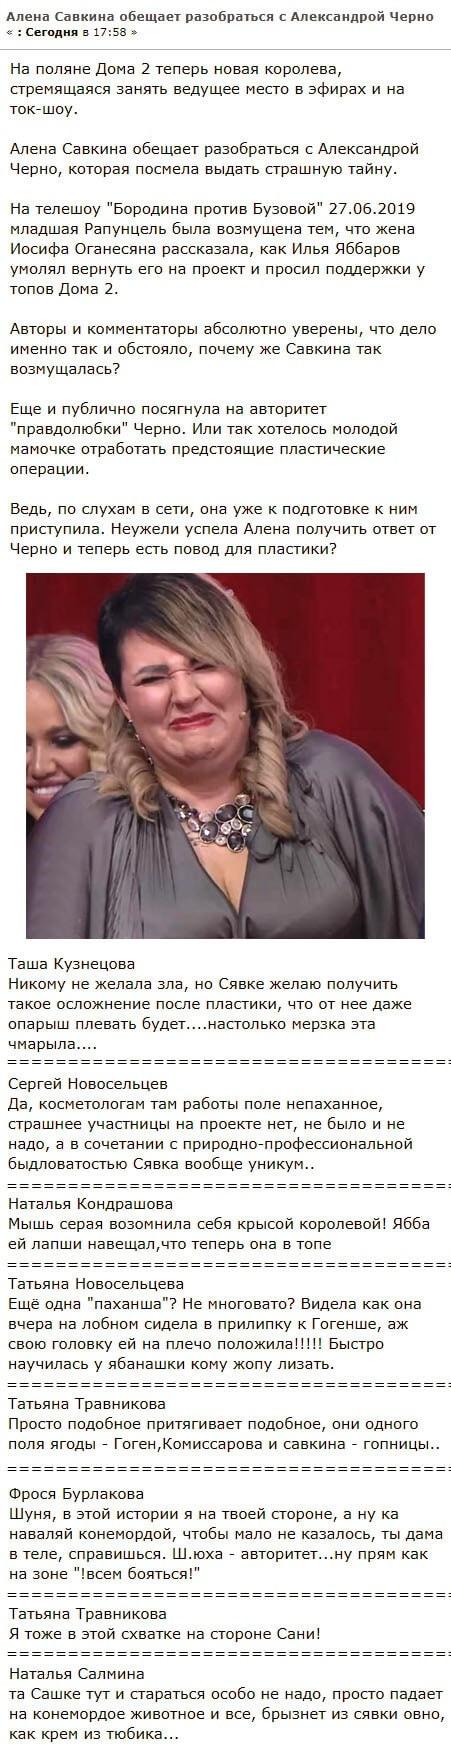 Алена Савкина восстала против обнаглевшей Александра Черно